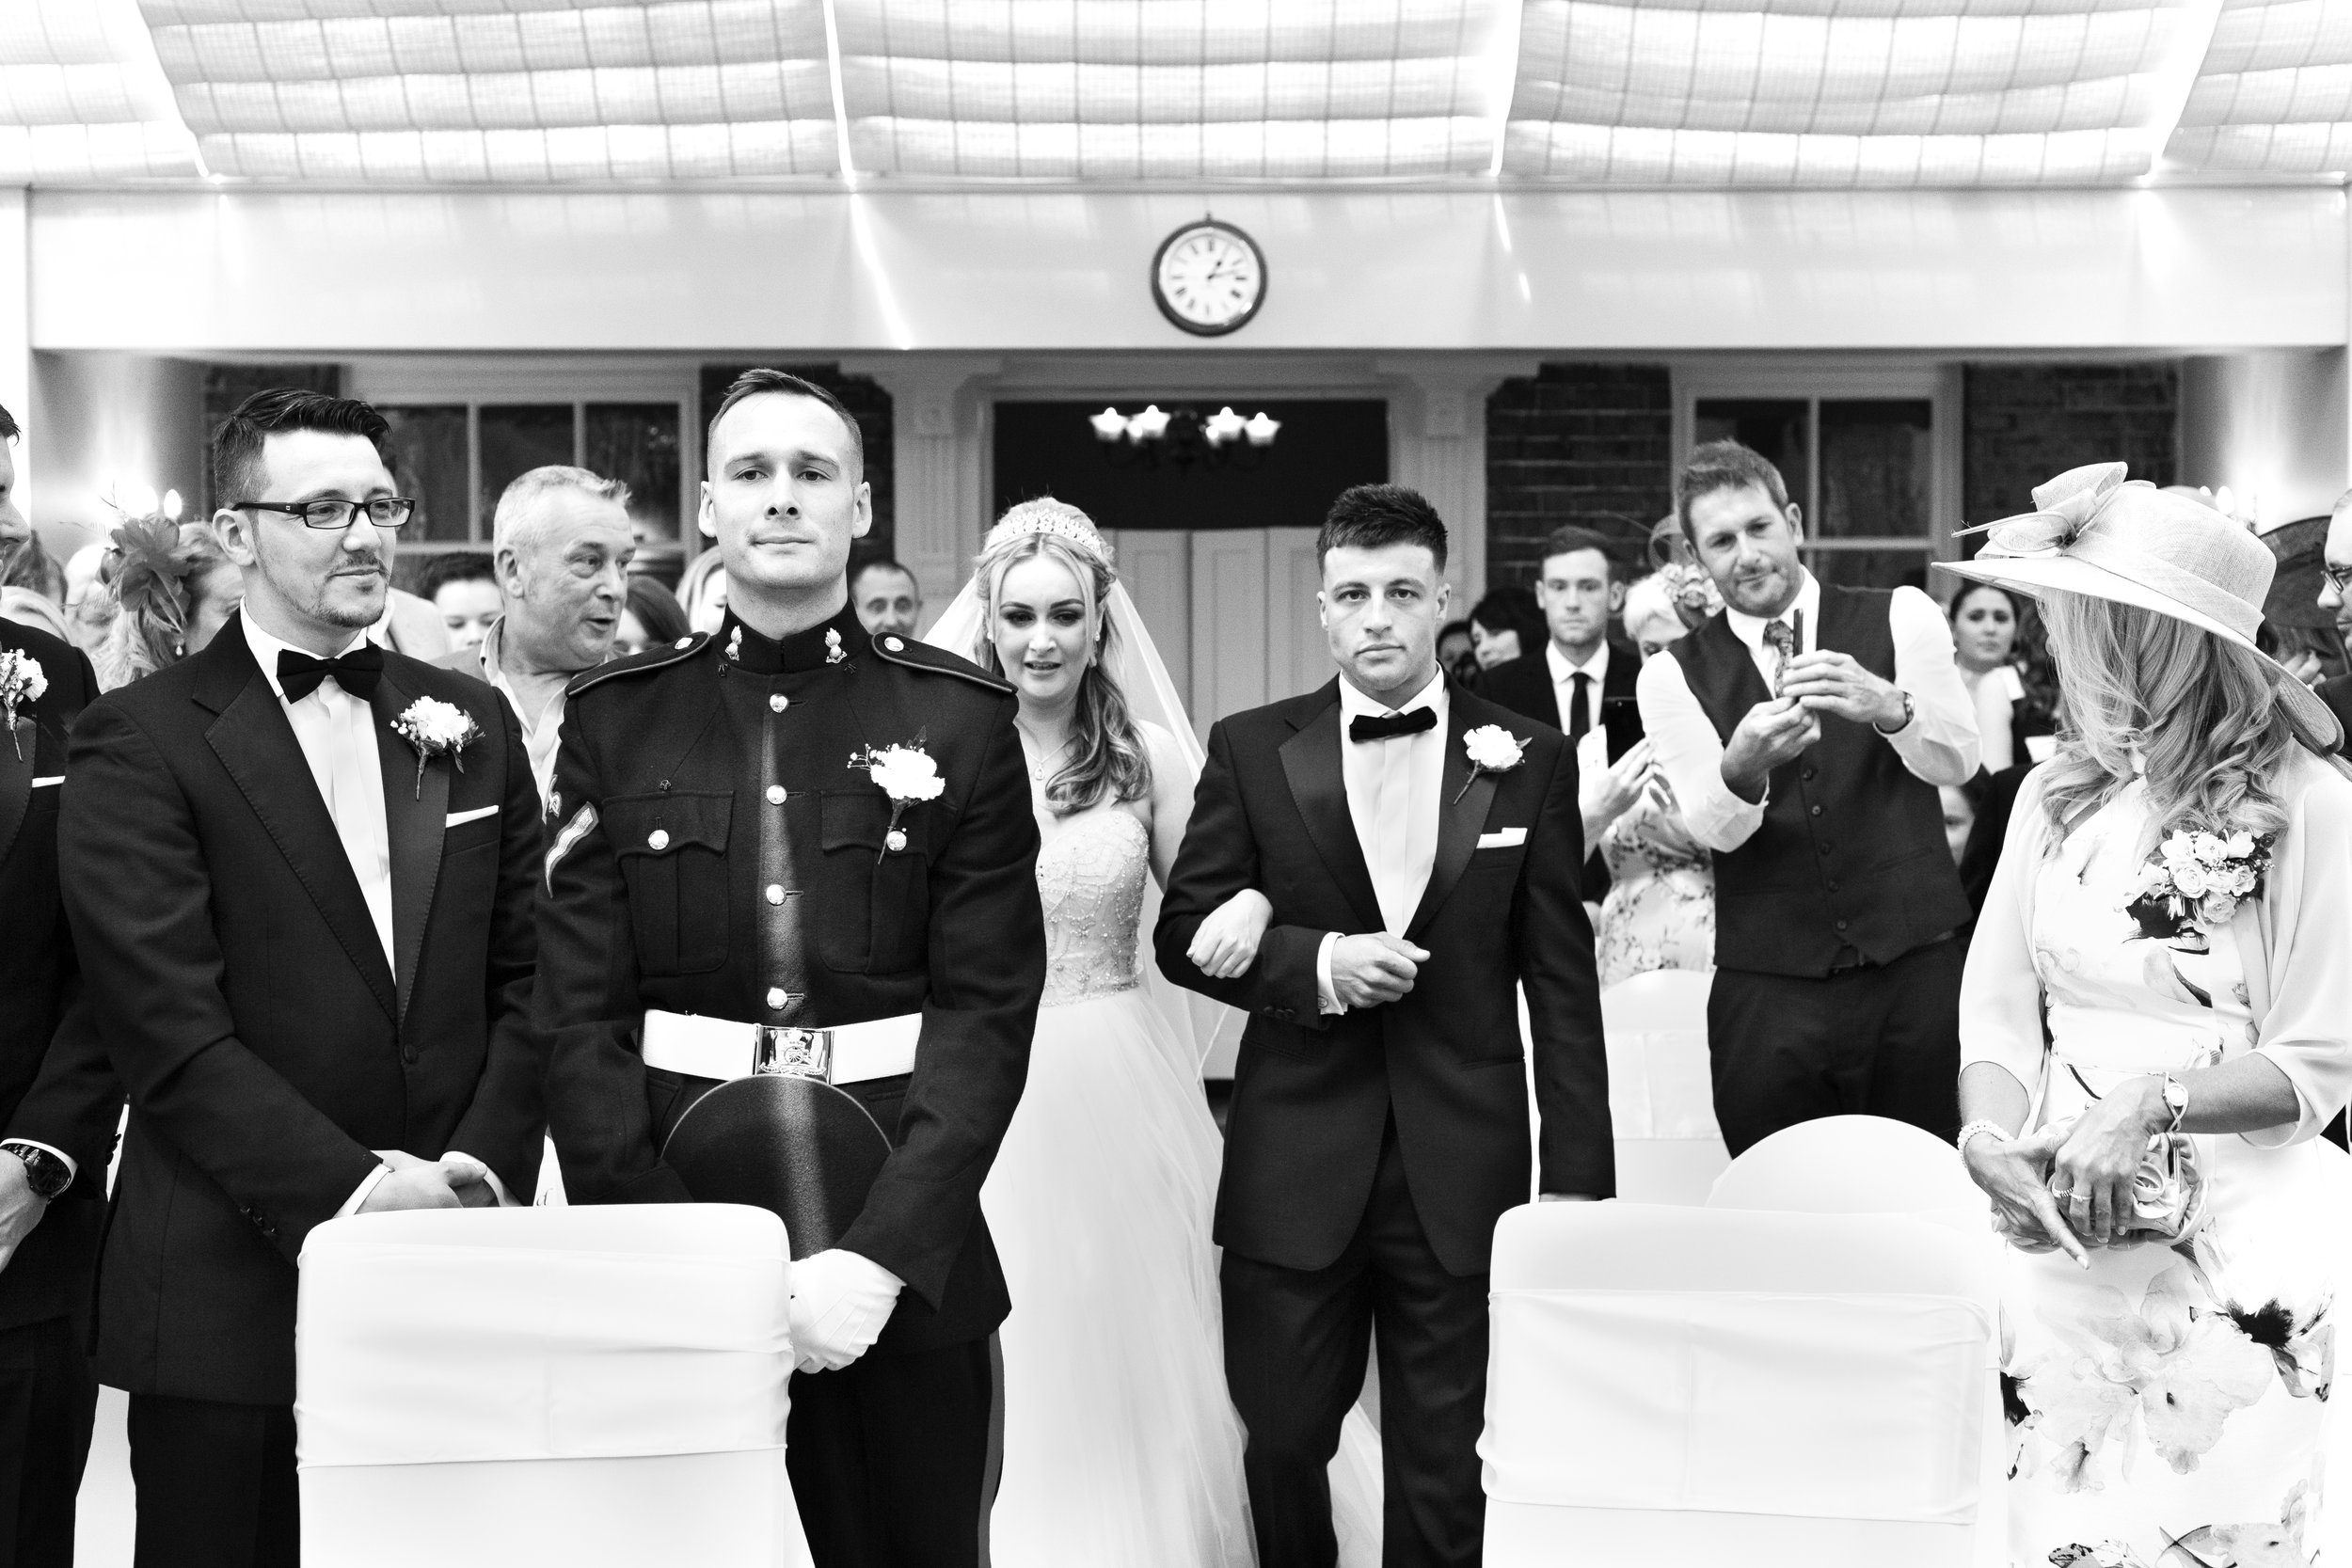 wedding-lea-cooper-photography-willenhall-west-midlands-wolverhampton-dudley-birmingham-uk-marriage-hadley-park-east-telford-walking-down-isle.jpg